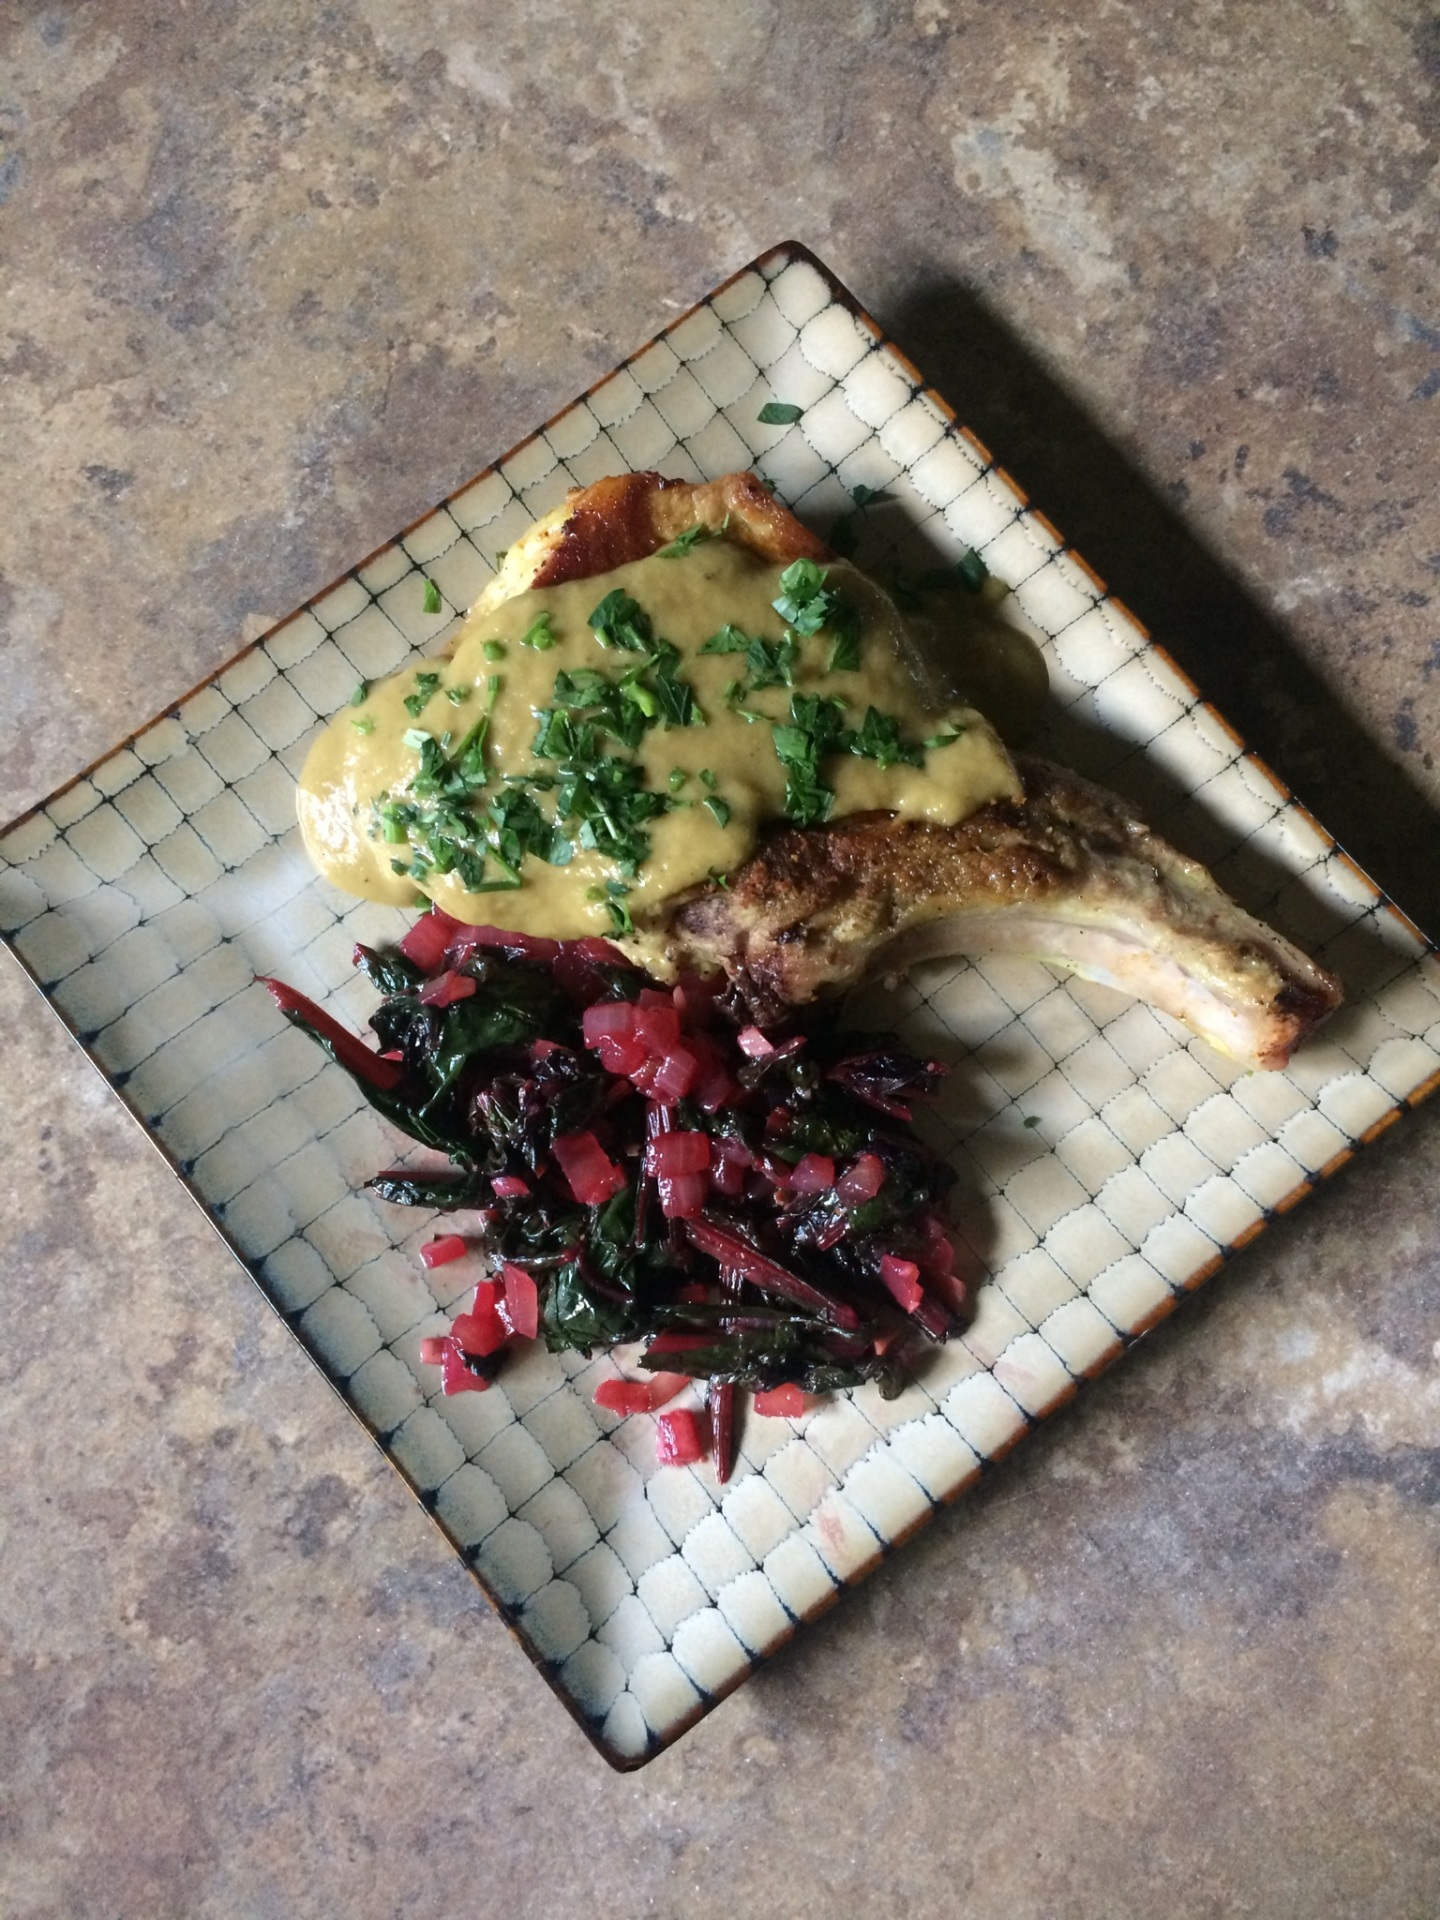 Pan-Seared Pork Chops with Apple-Rhubarb Gravy